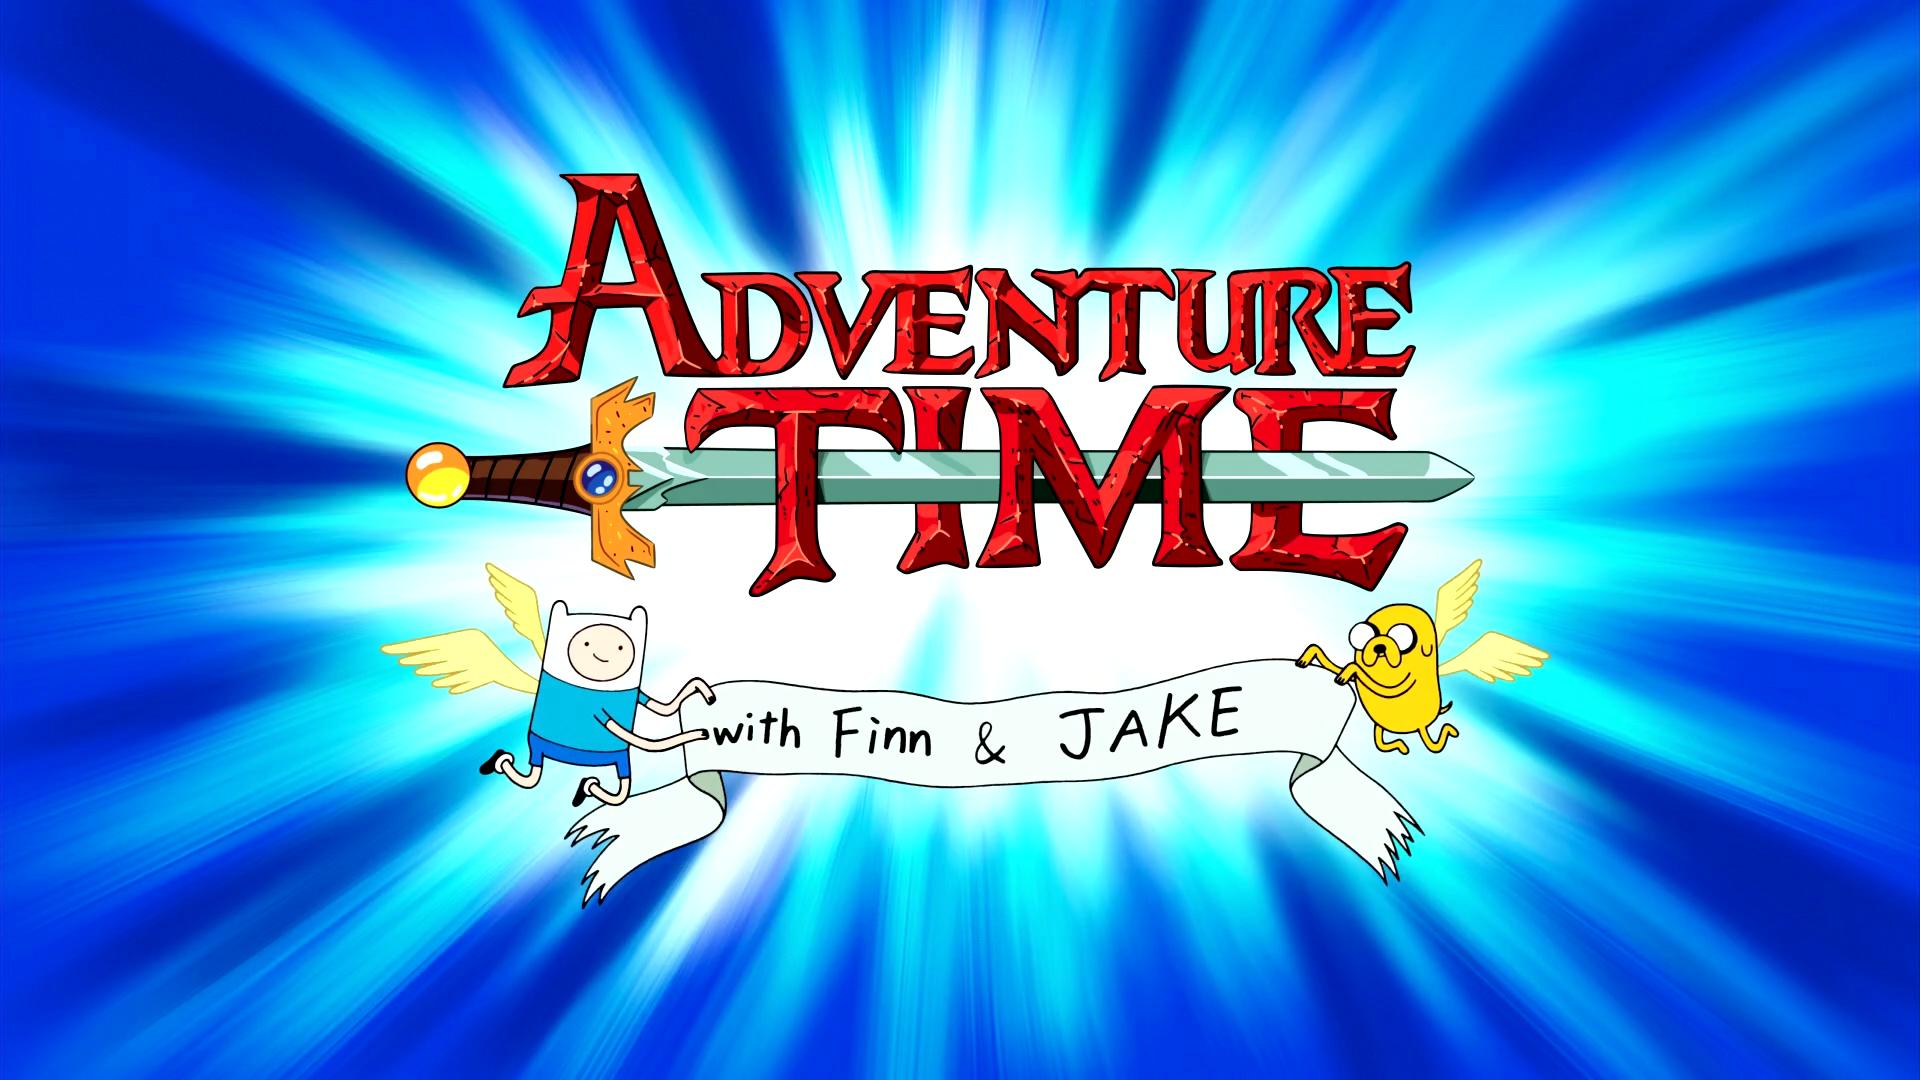 Pin By Chris Makowski On Adventure Time Adventure Time Theme Song Adventure Time Seasons Watch Adventure Time